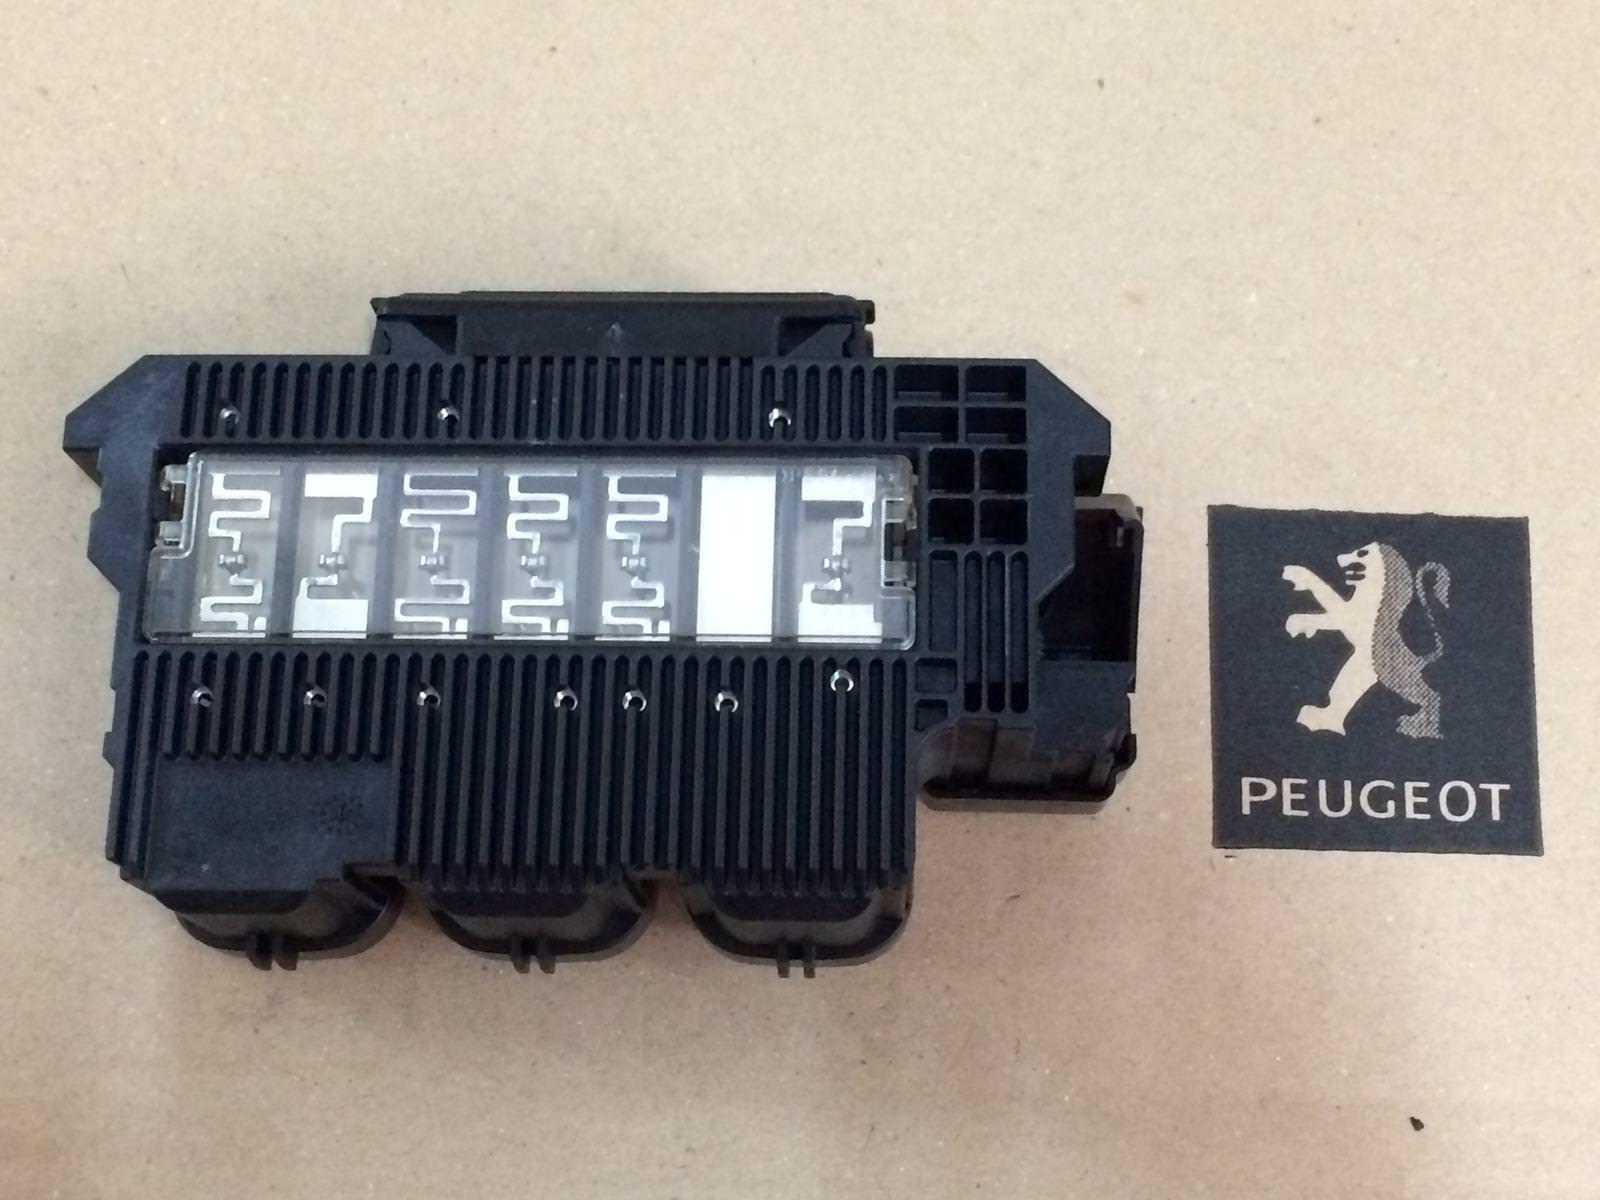 peugeot 407 - fuse box  ‹ ›